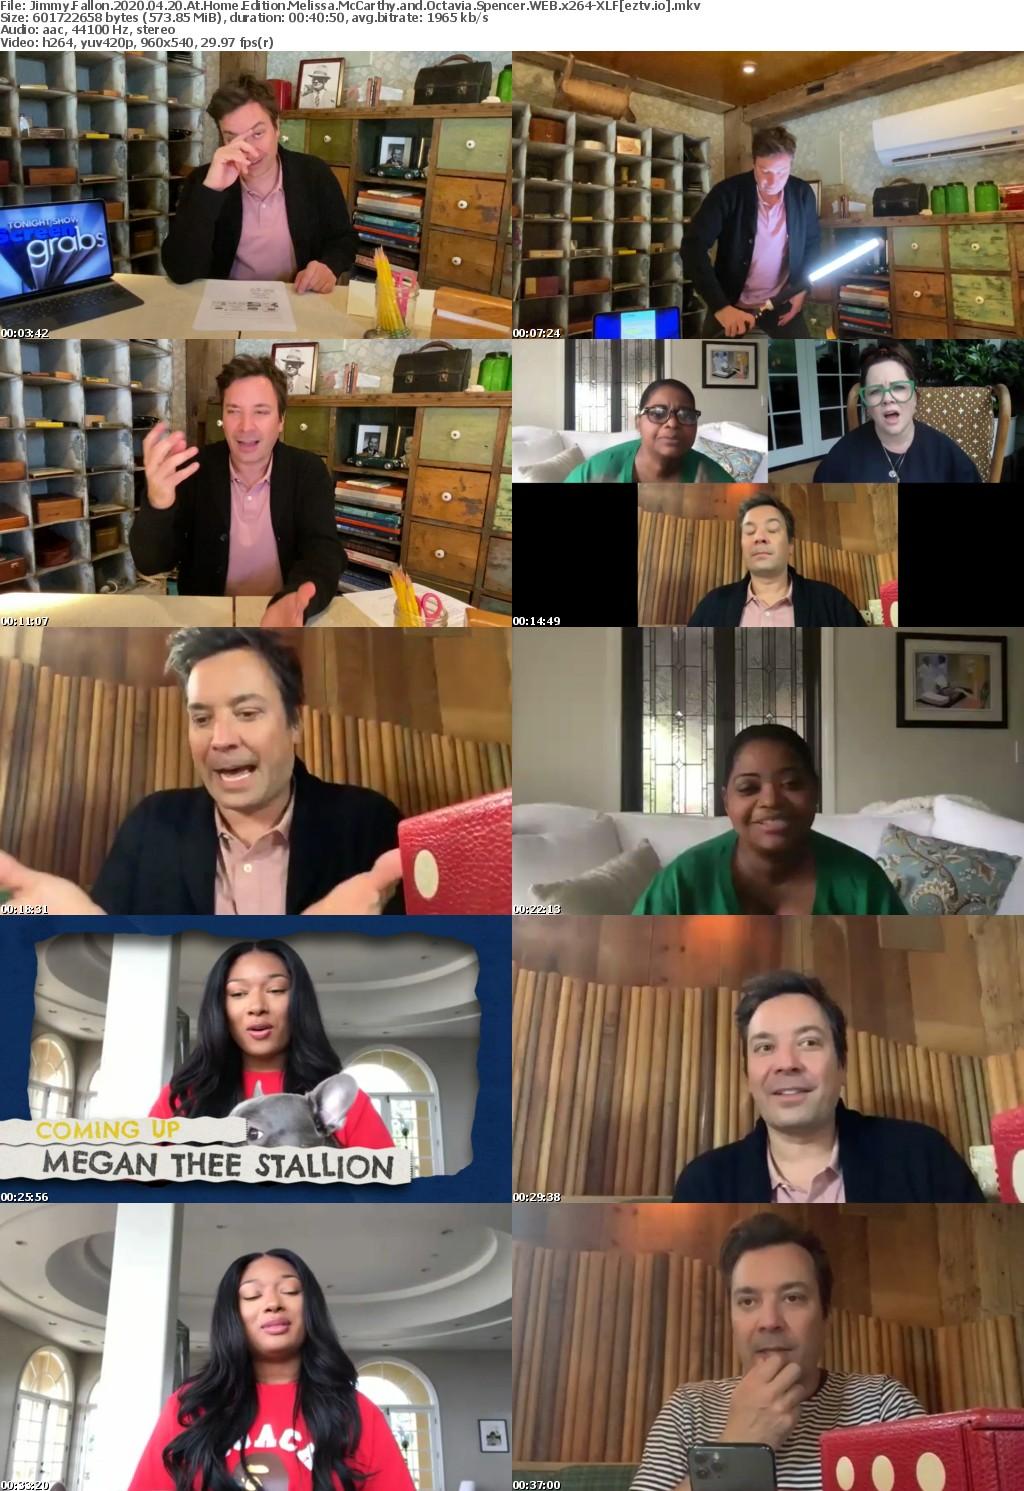 Jimmy Fallon 2020 04 20 At Home Edition Melissa McCarthy and Octavia Spencer WEB x264-XLF